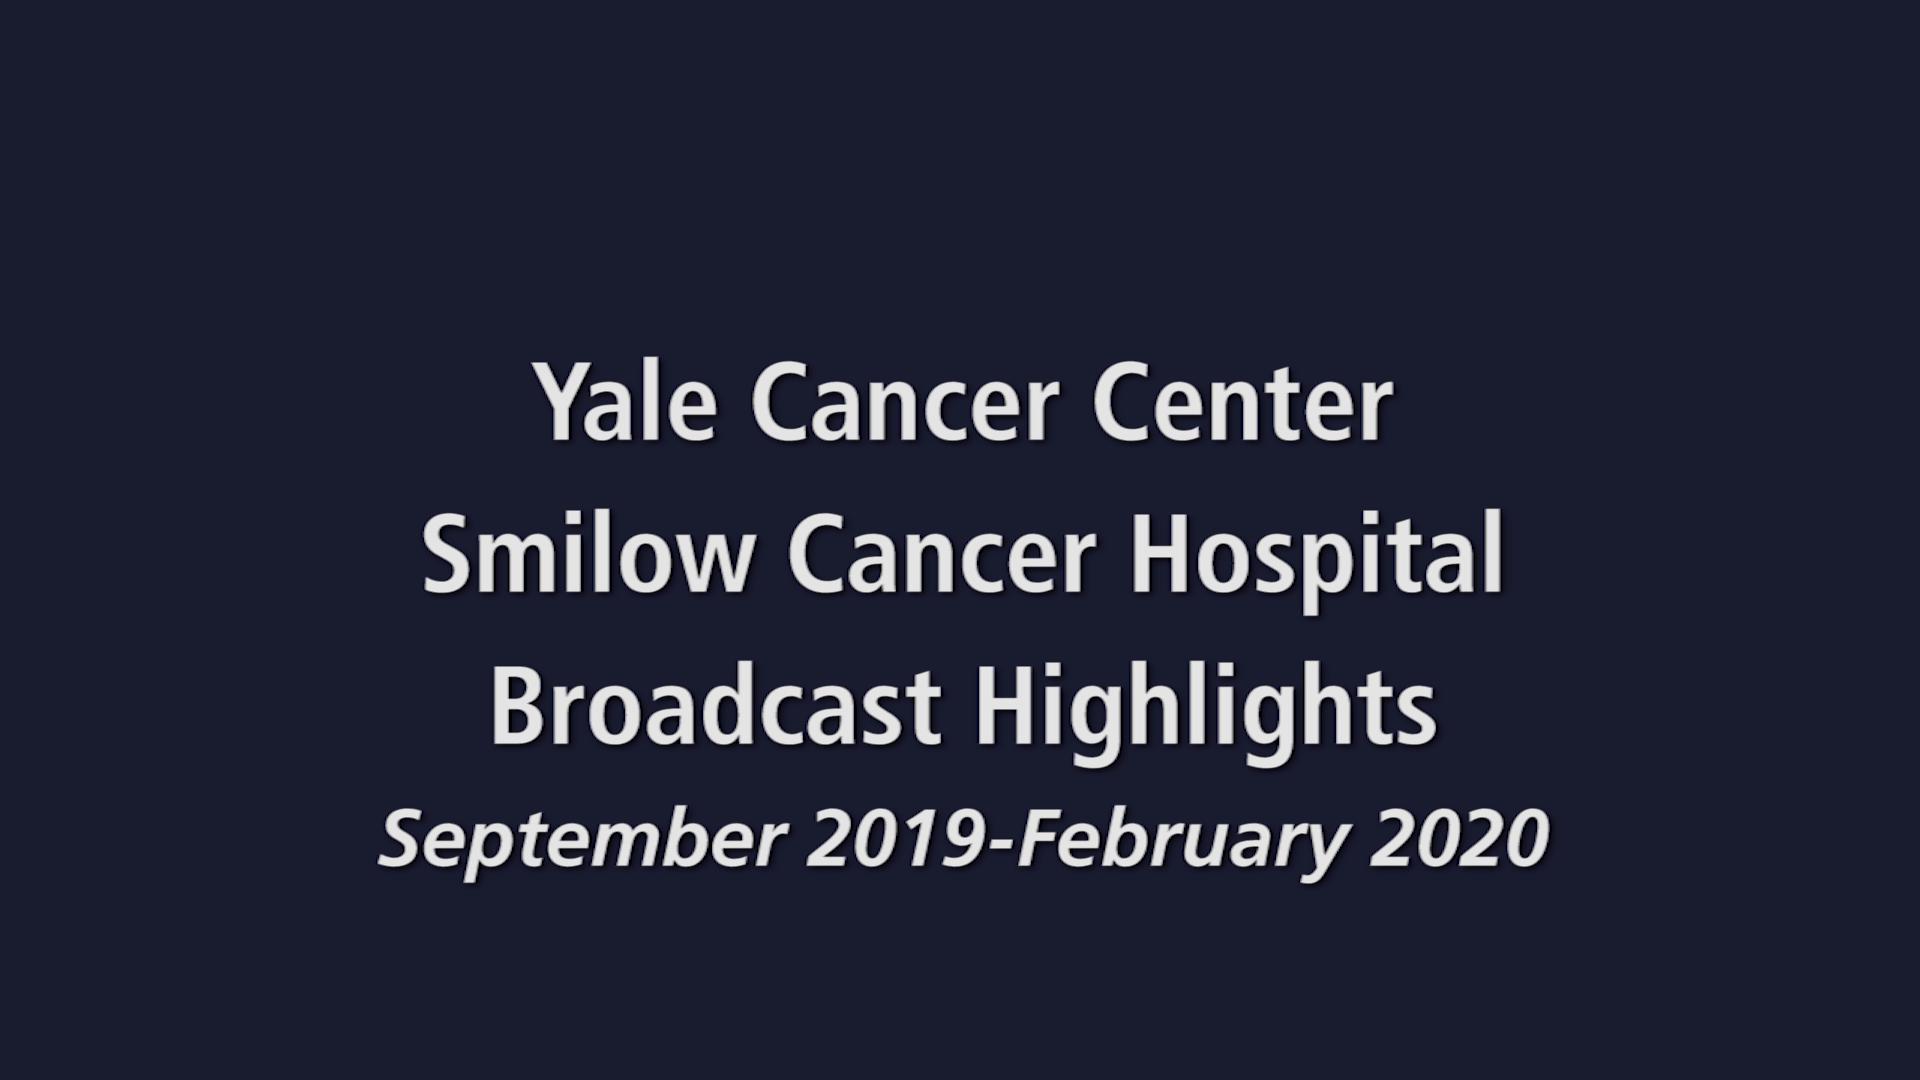 Smilow Cancer Hospital/Yale Cancer Center Broadcast Highlights